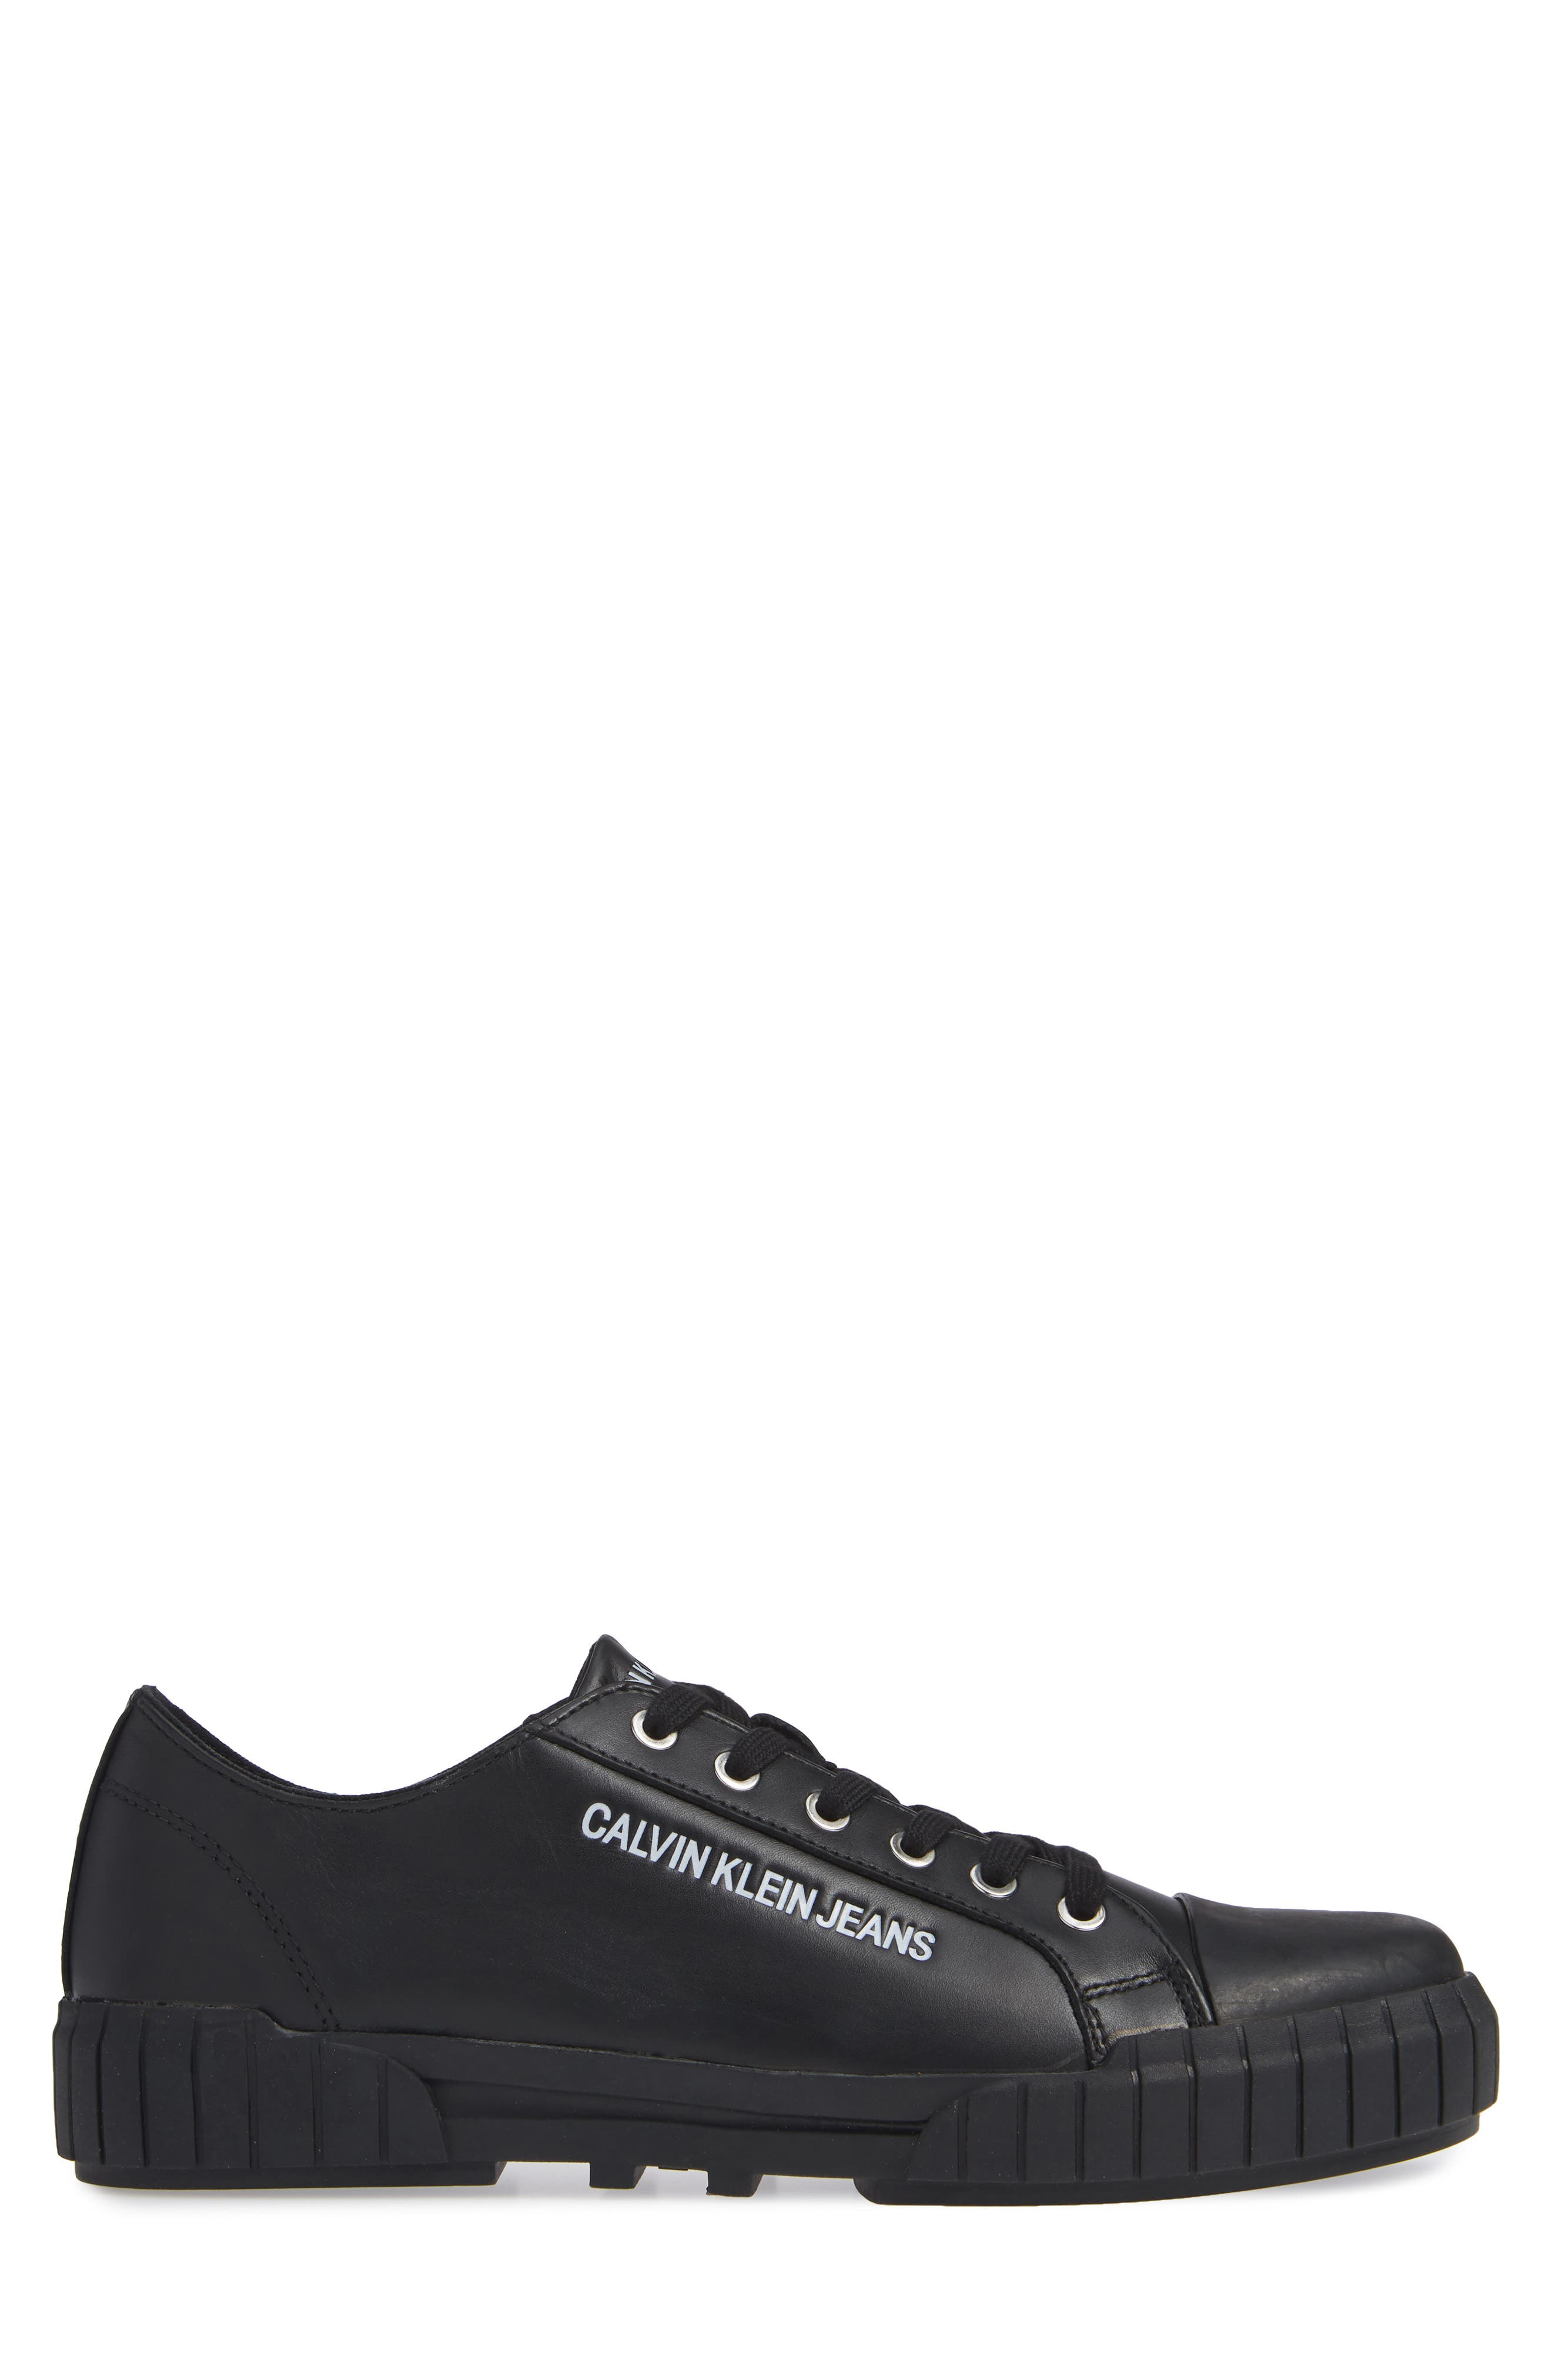 Burton Sneaker,                             Alternate thumbnail 3, color,                             001